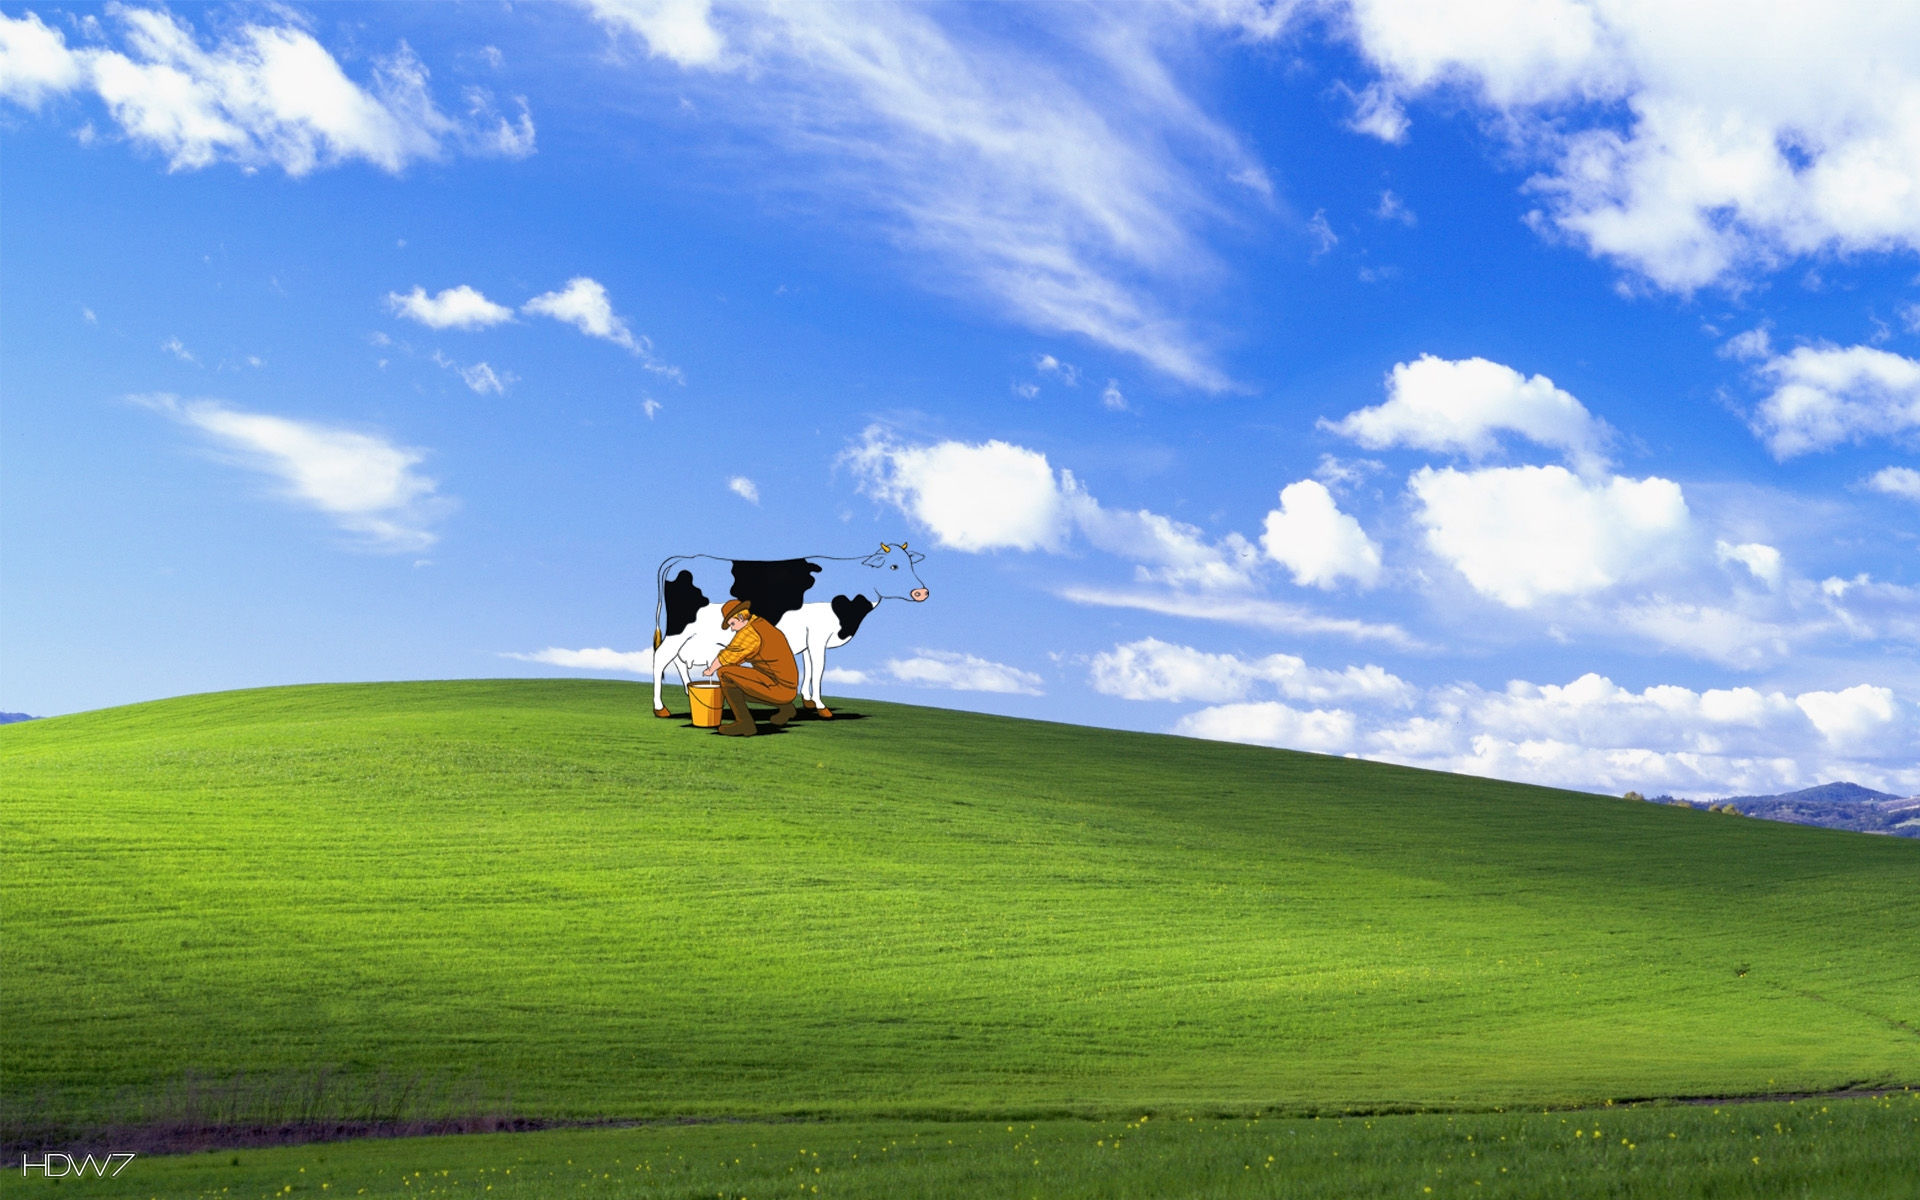 Funny Windows Xp Wallpaper Funny Windows Backgrou...